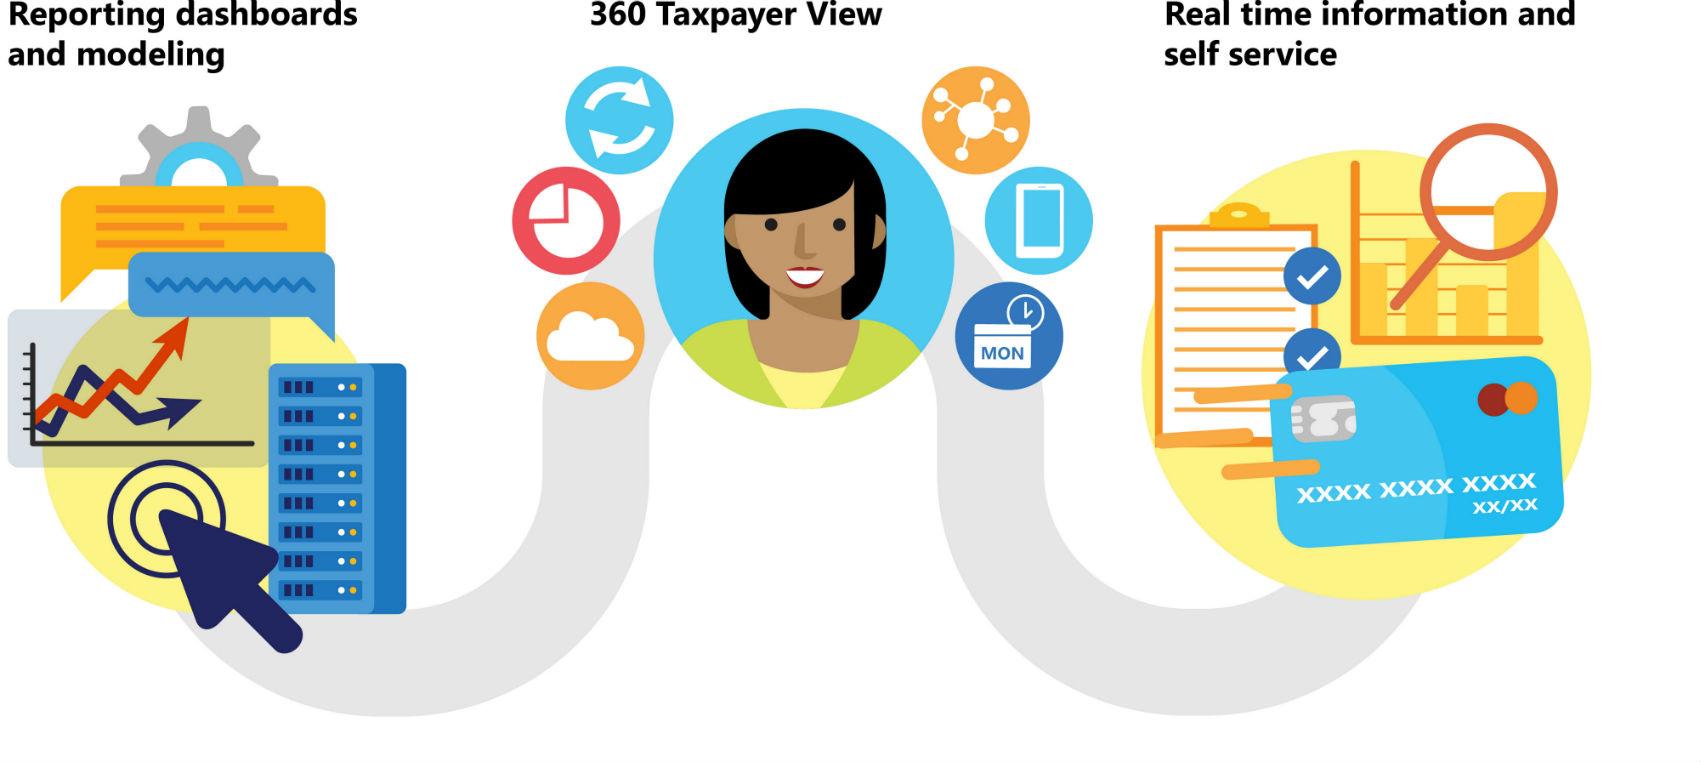 Tax_Revenue_Management_how_it_works